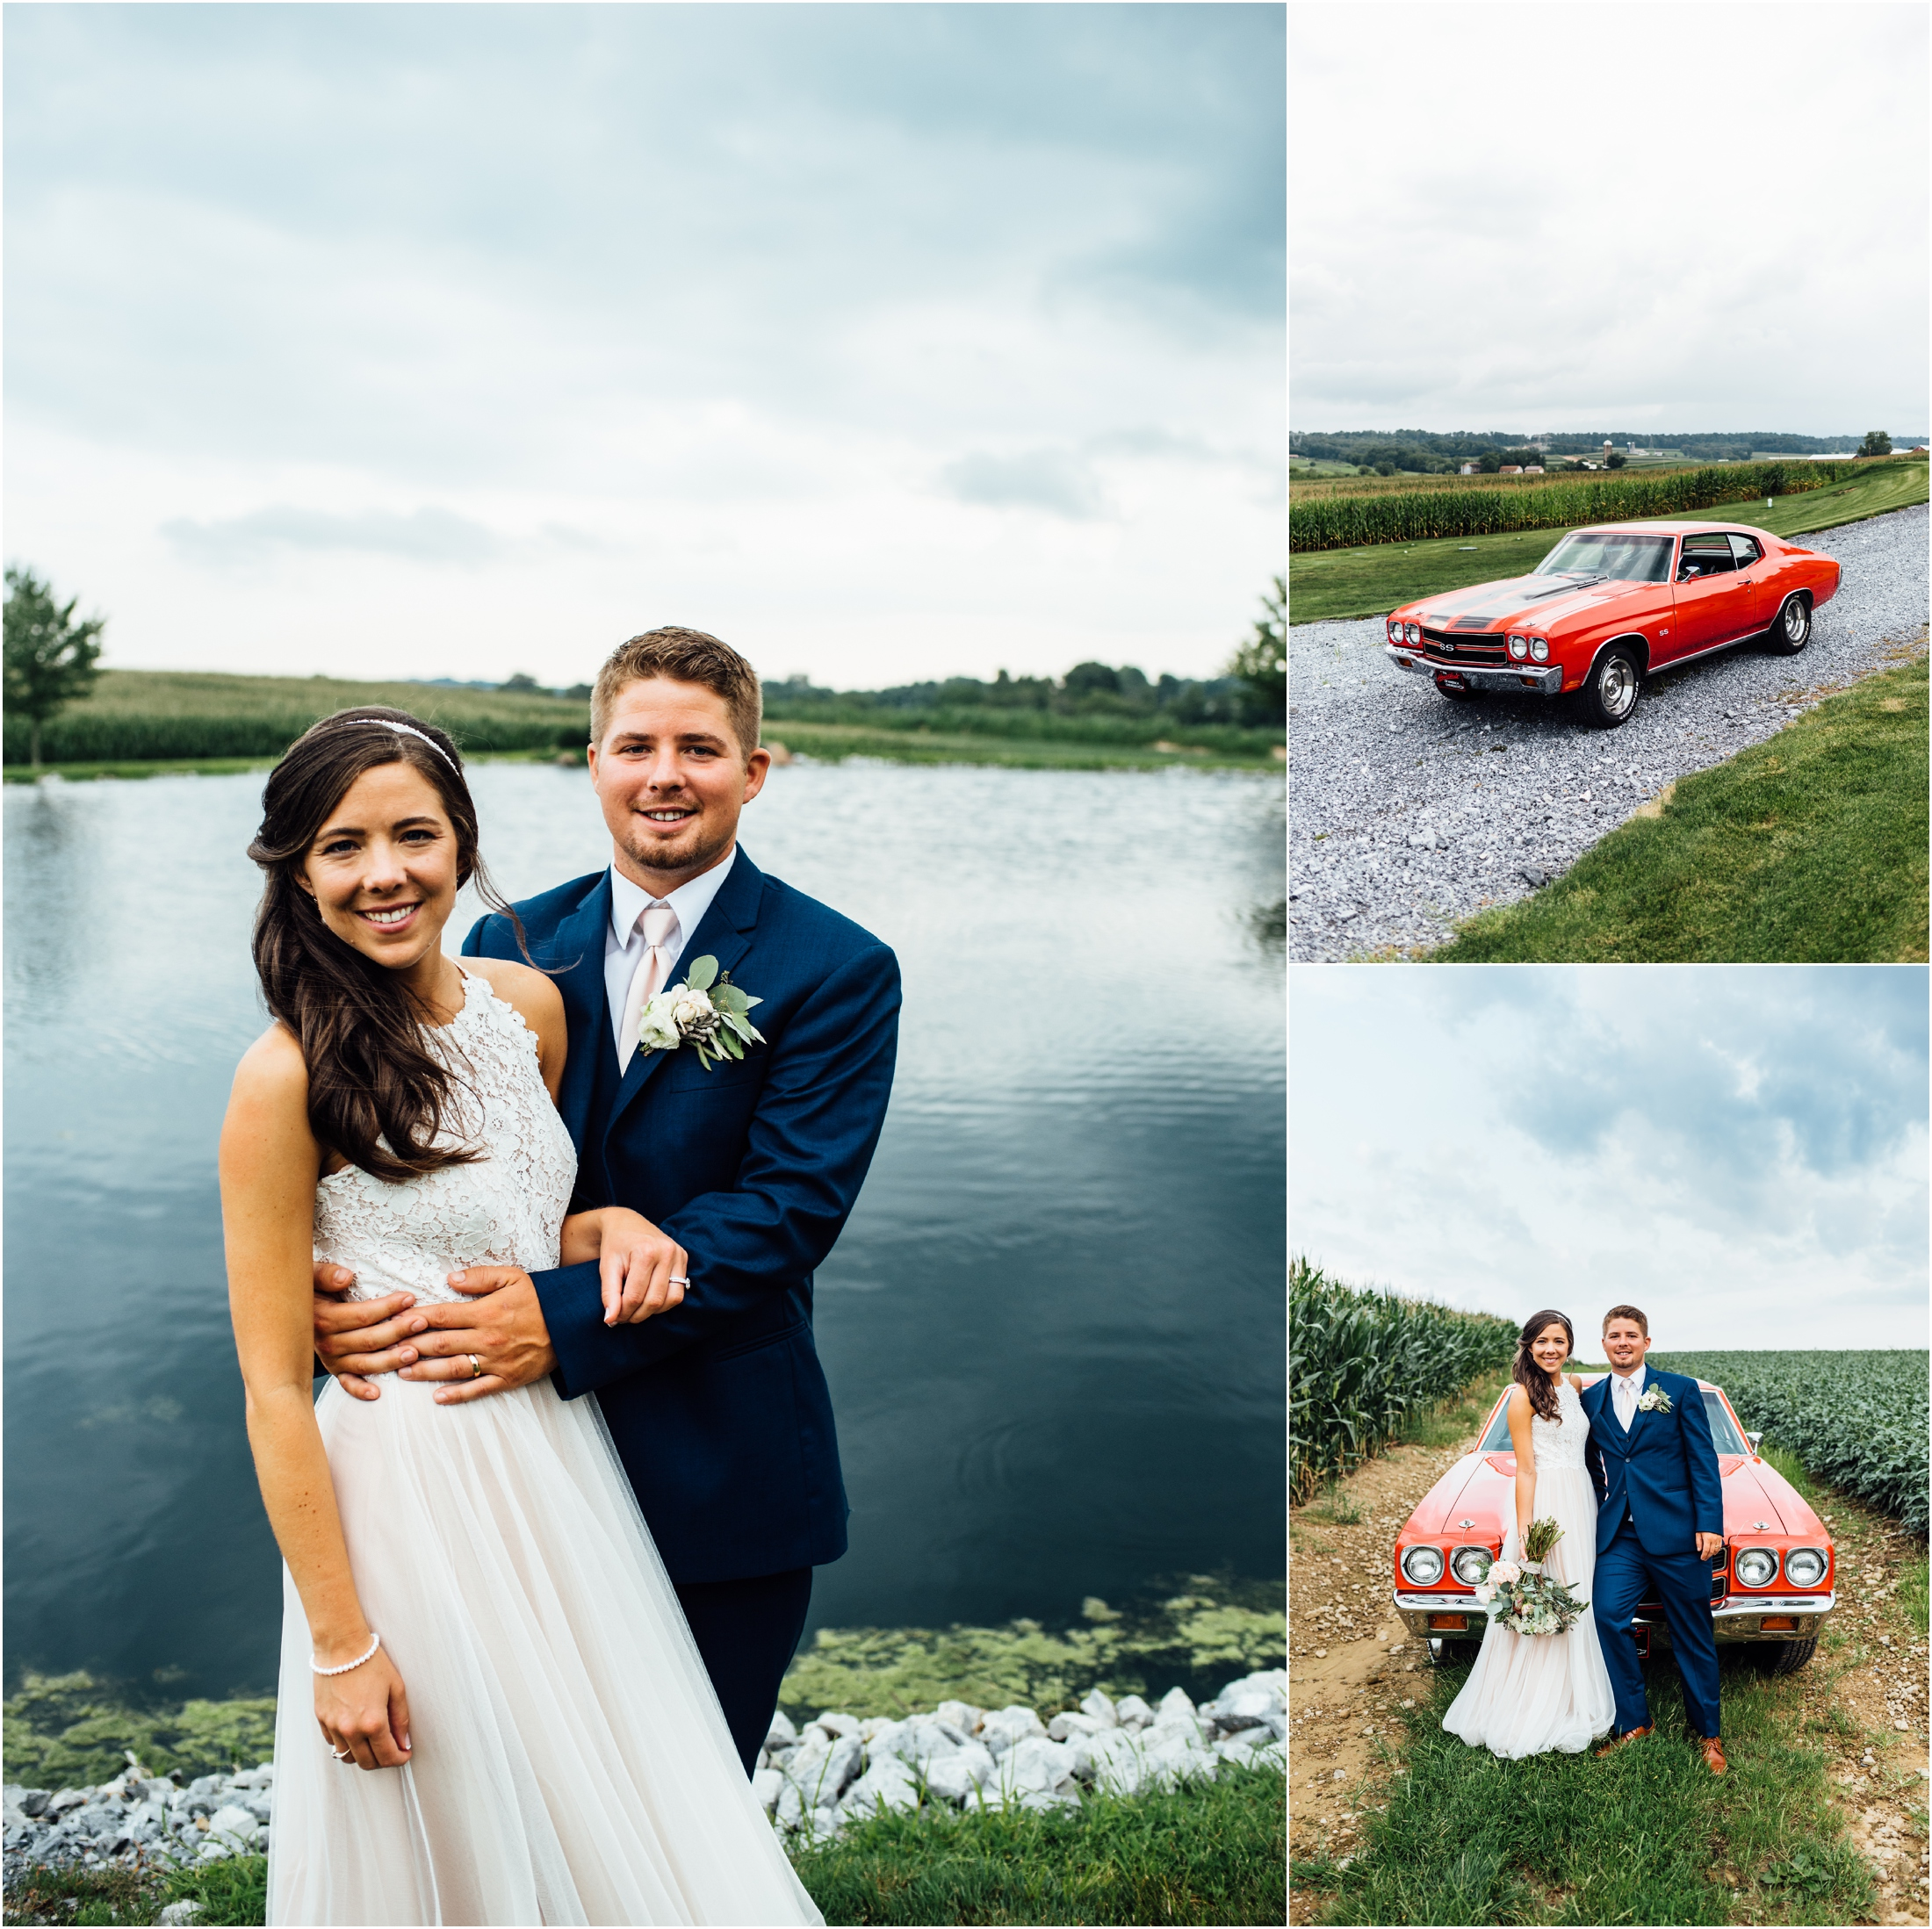 Steph&Bryan_Lancaster_wedding_farm_0550.jpg